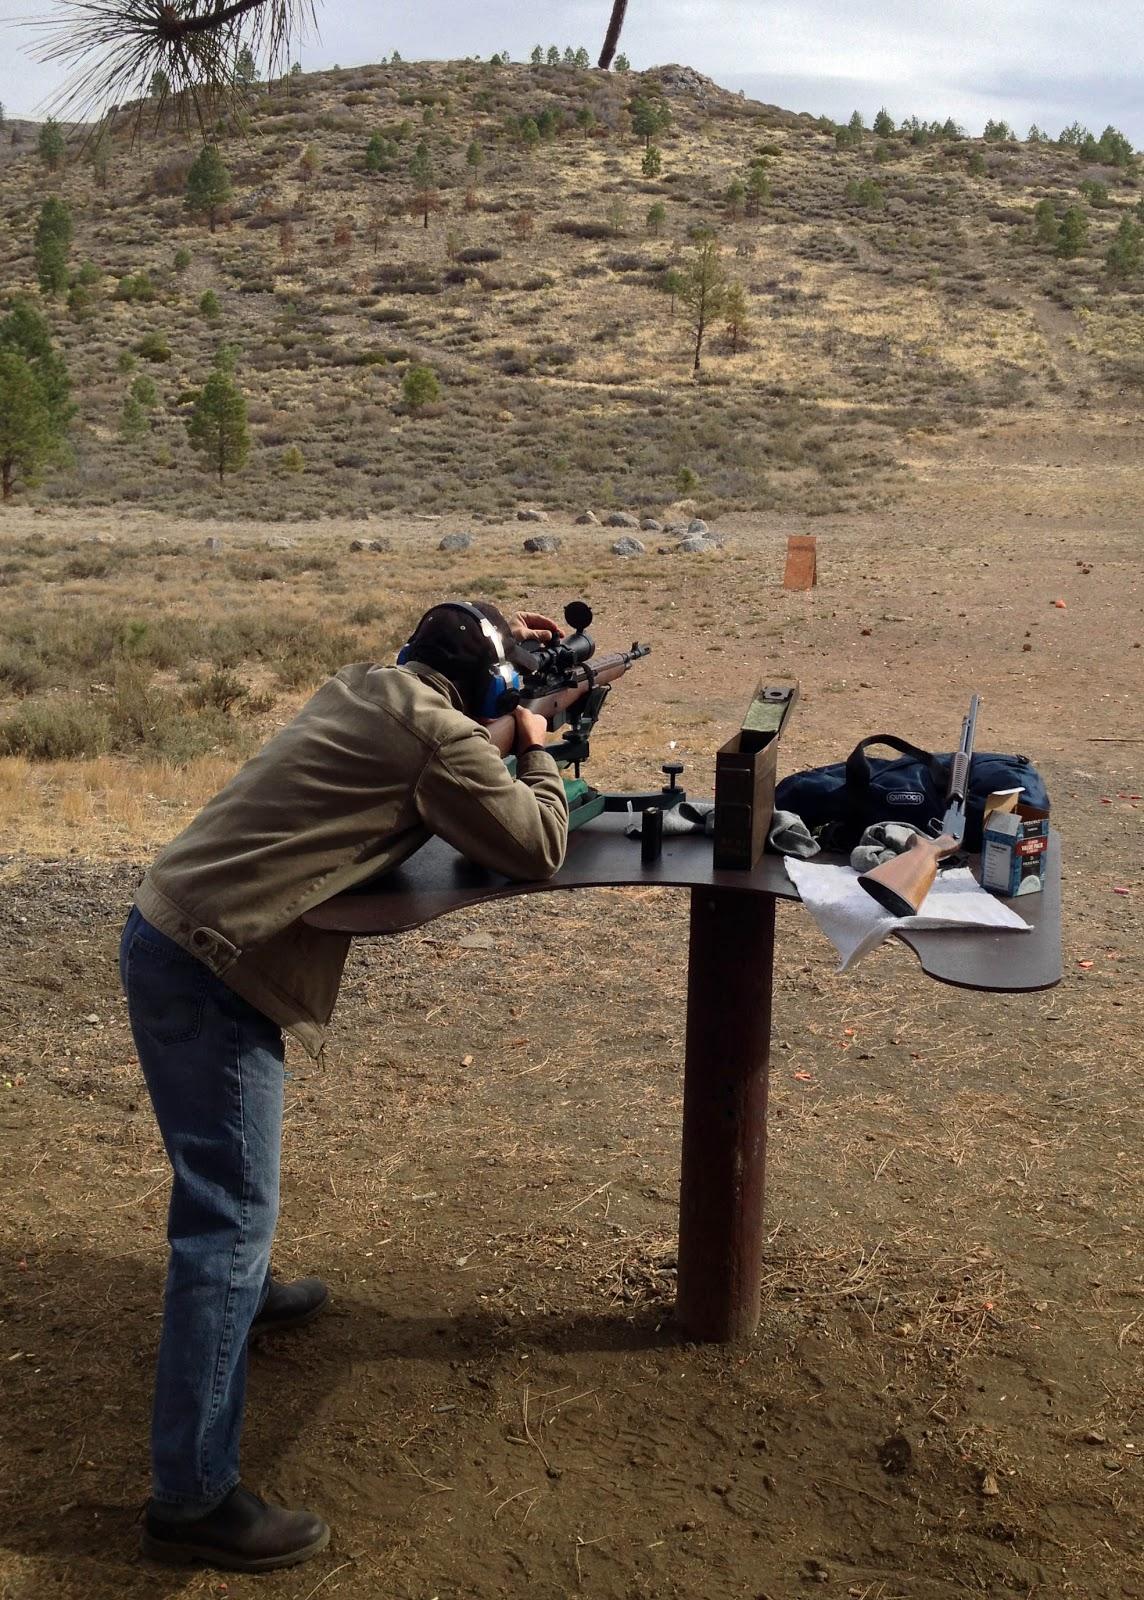 Tahoe Truckee Outdoor: Target Shooting